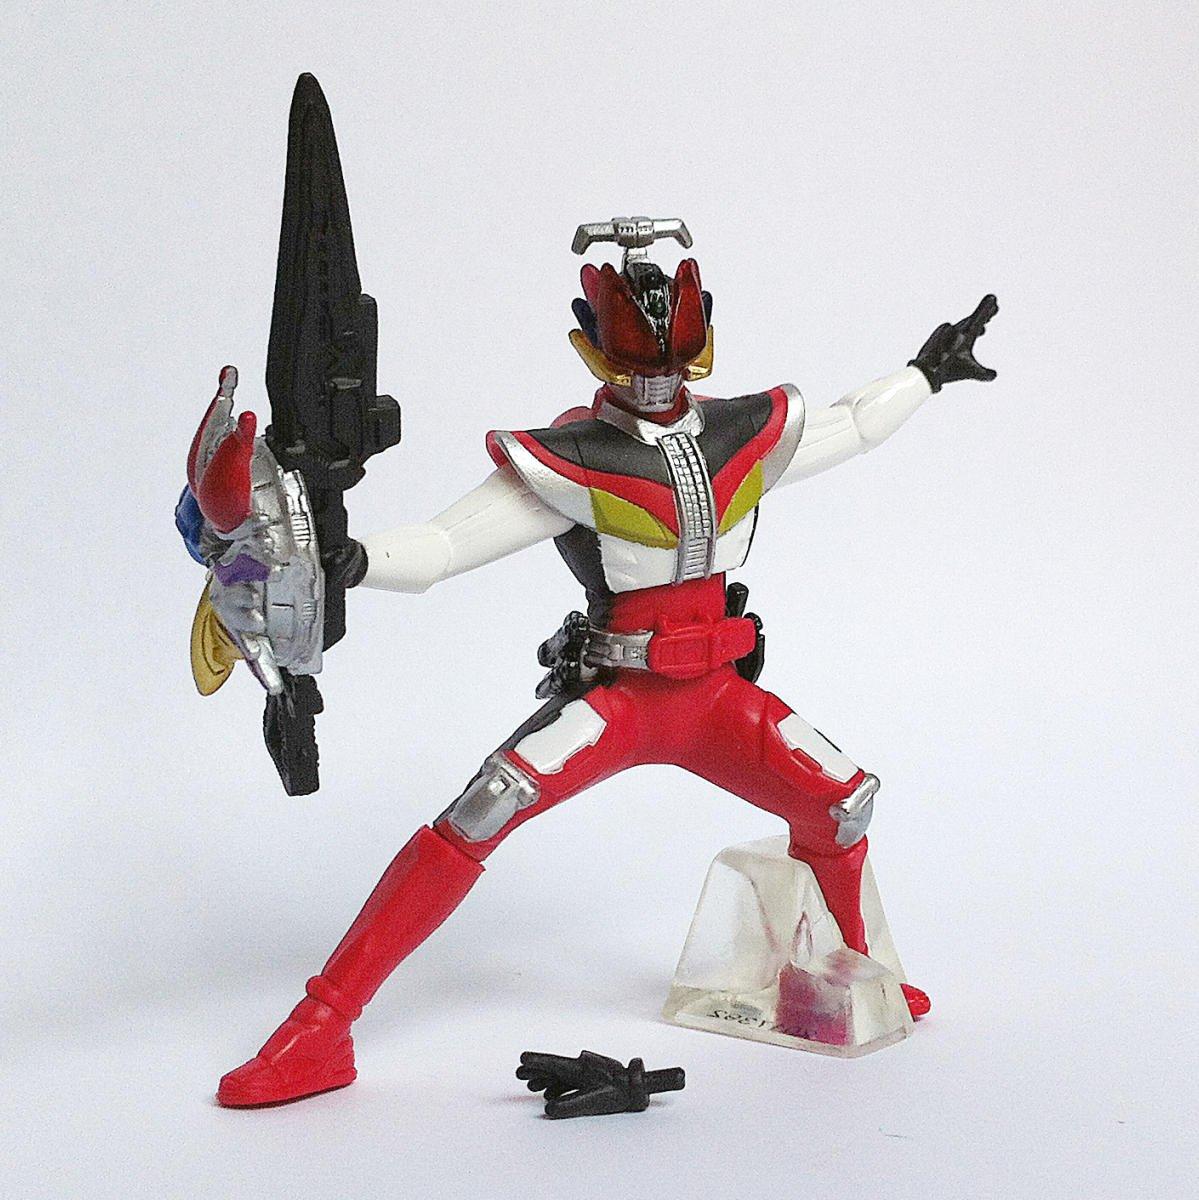 Kamen Rider Den�O Liner Form from HG CORE Kamen Rider by Bandai